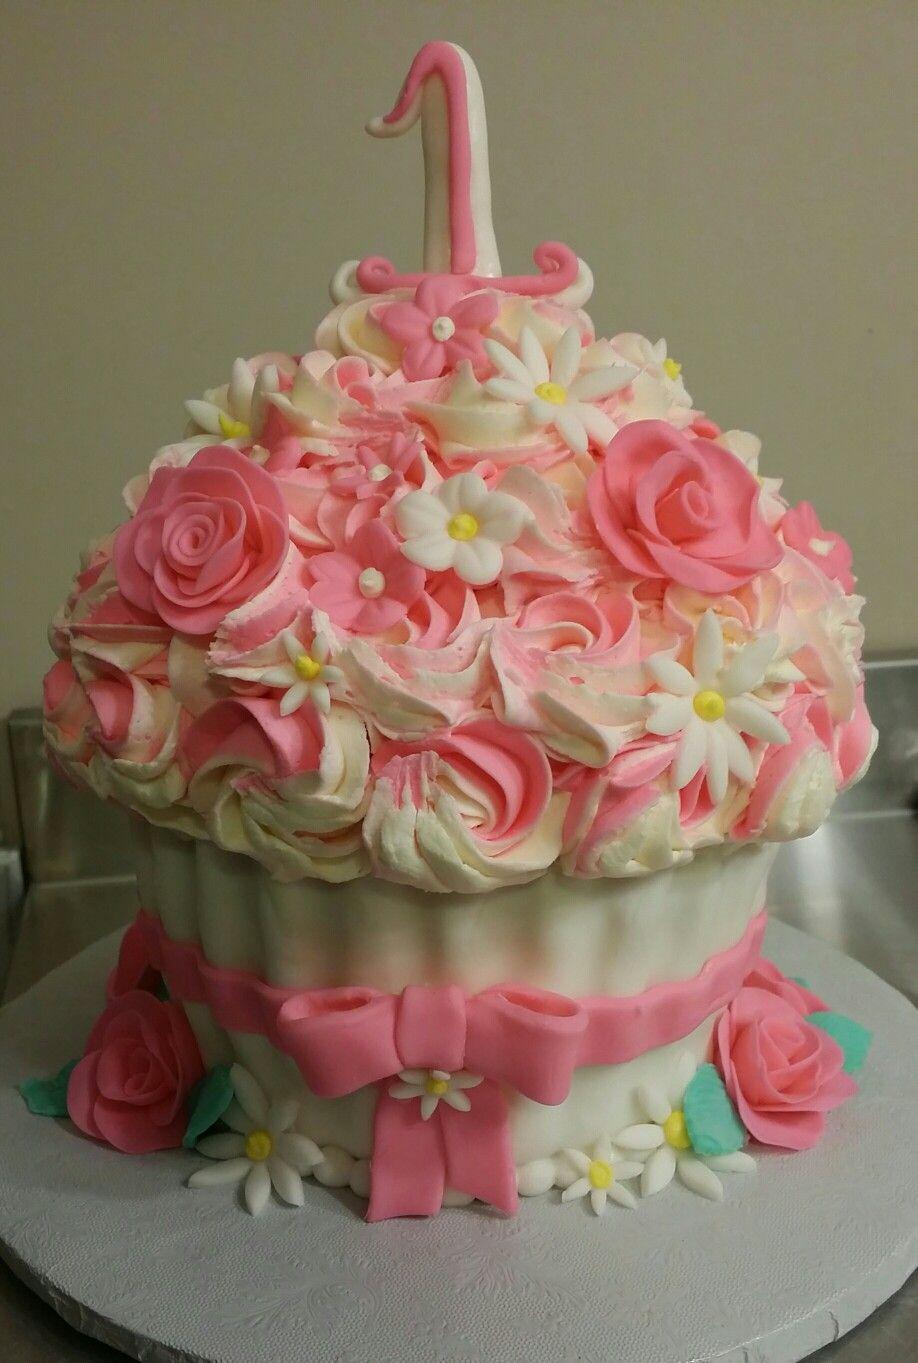 Giant Cupcake One Year Old Smash Cake 1 Birthday